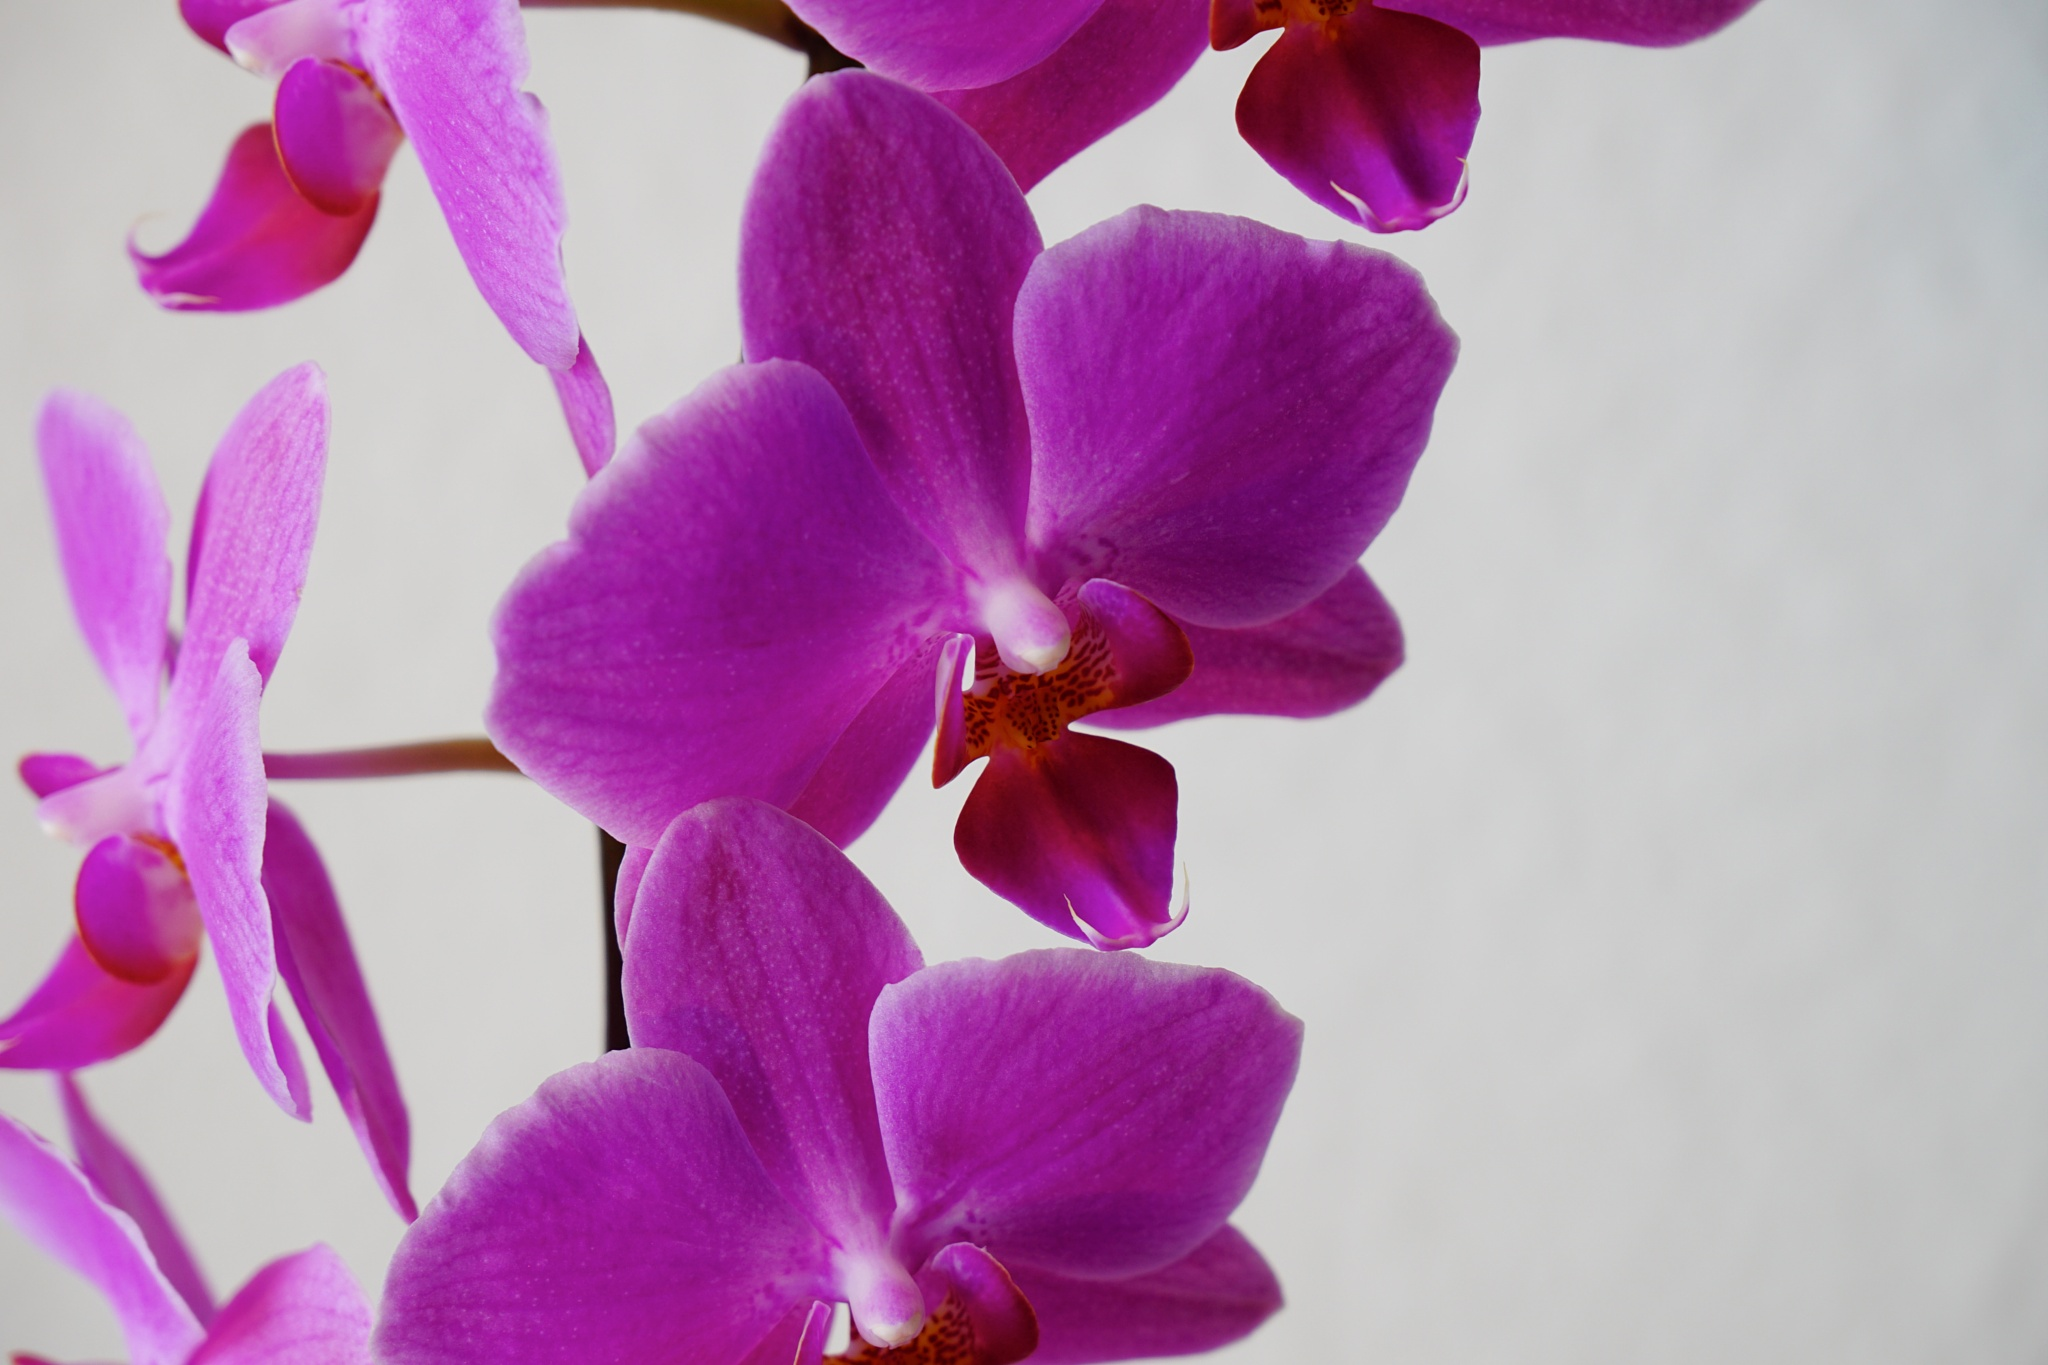 My orchids by Dorte Hedengran